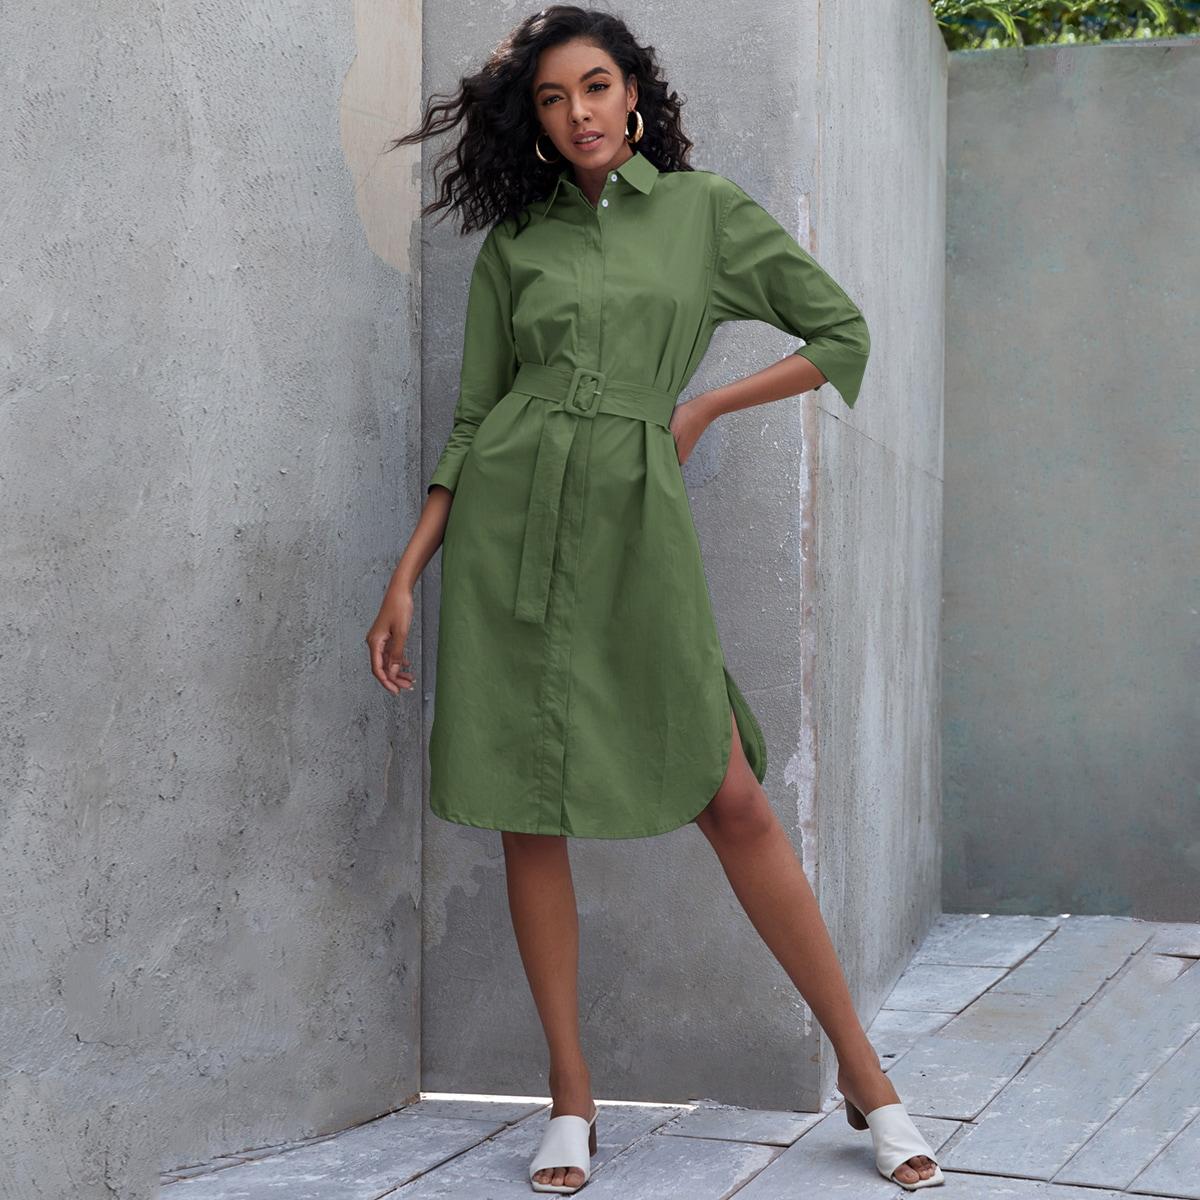 SHEIN / Solid Curved Hem Shirt Dress With Belt